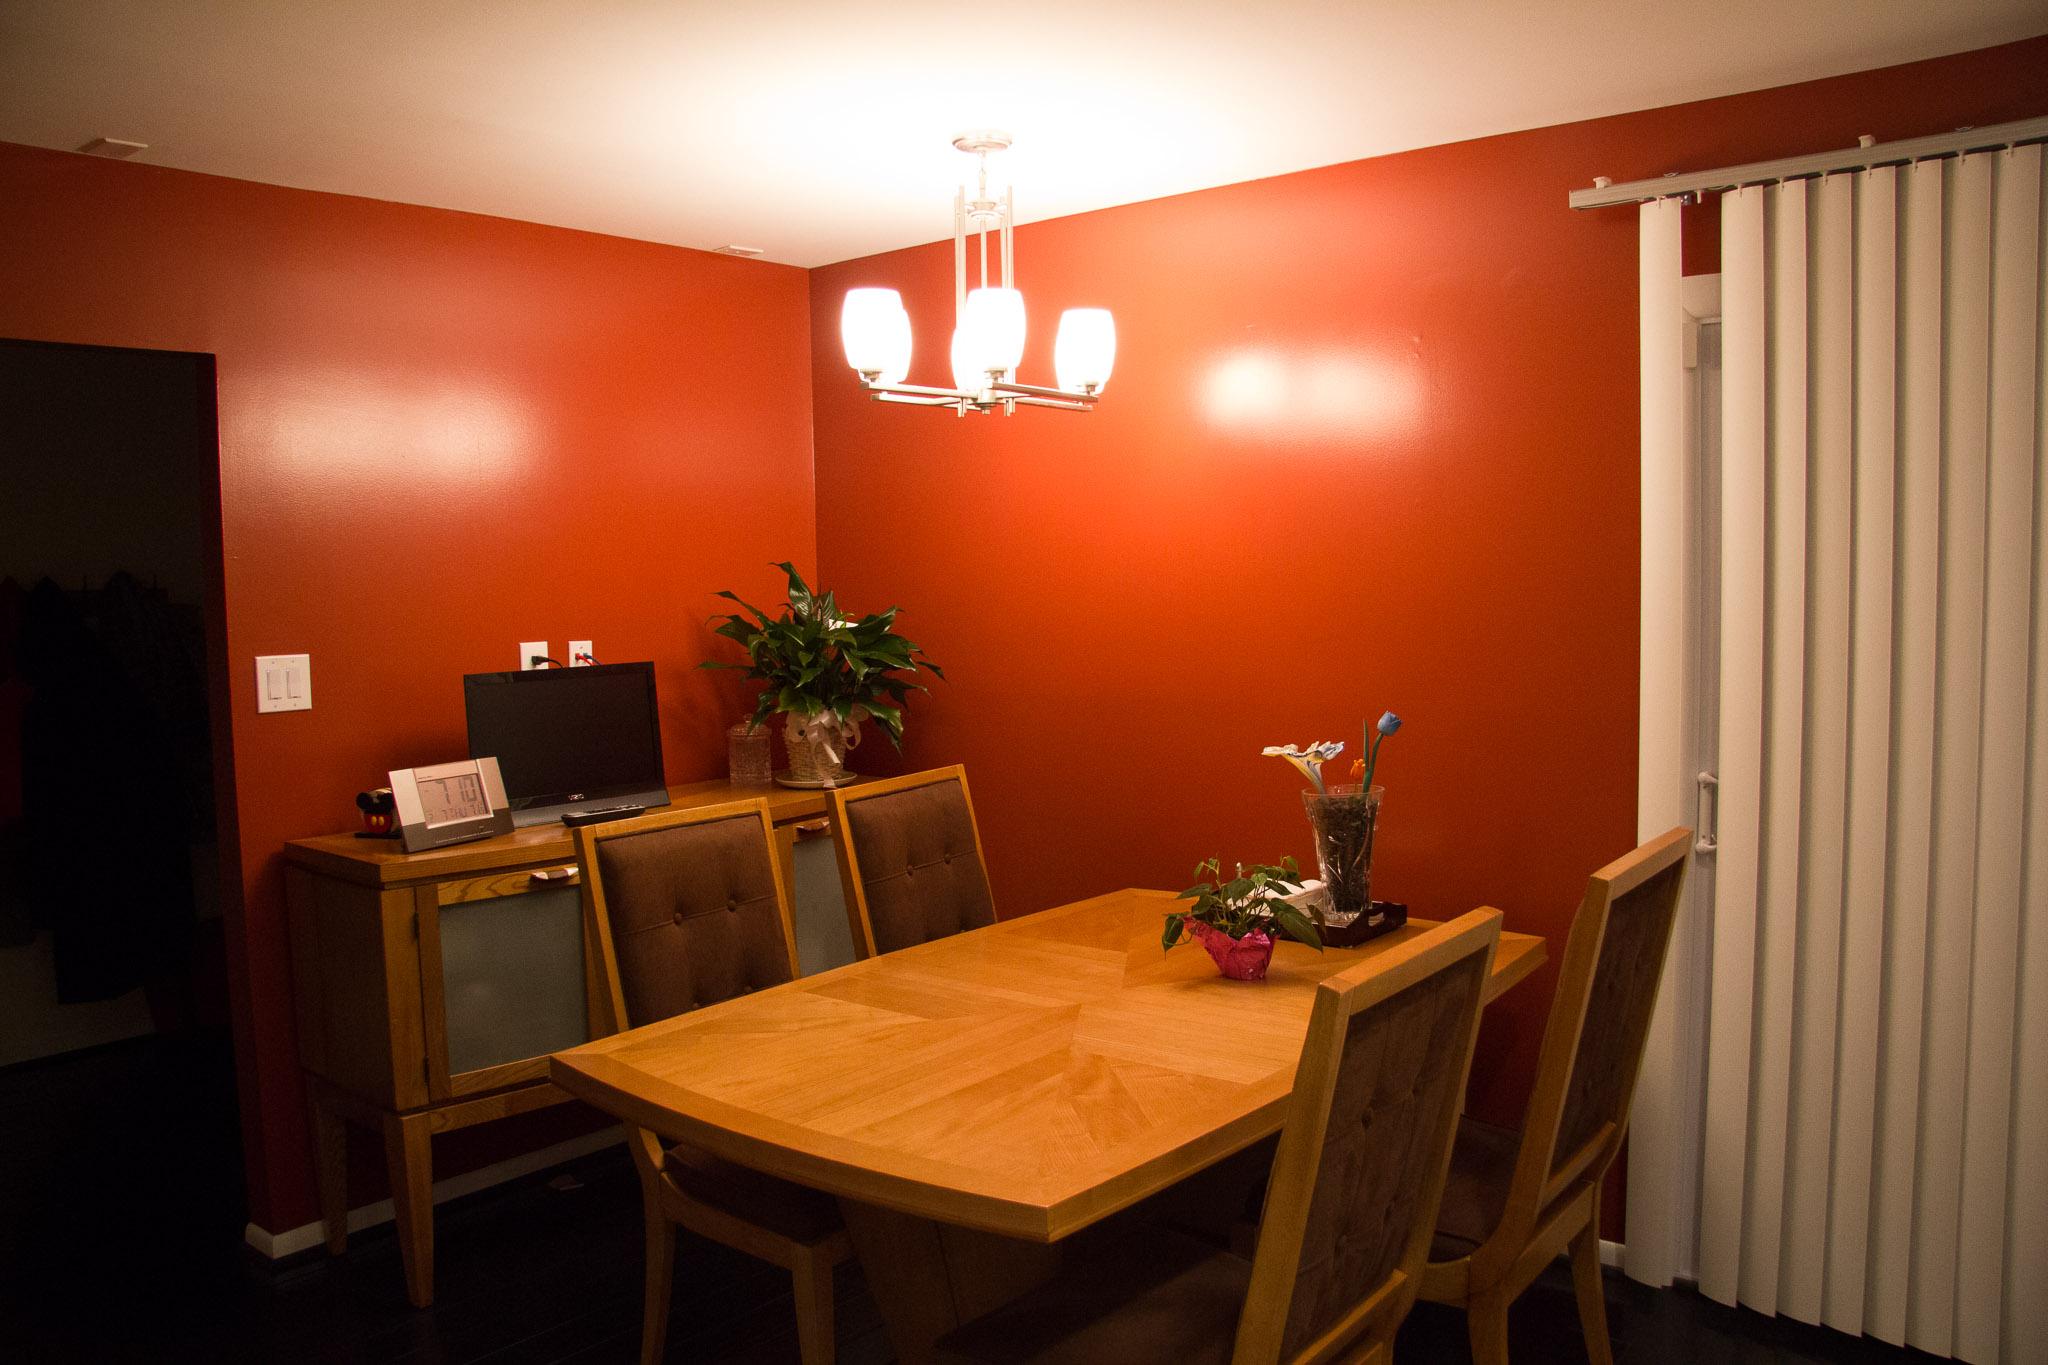 diy kitchen banquette bench using ikea cabinets ikea hacks. Black Bedroom Furniture Sets. Home Design Ideas